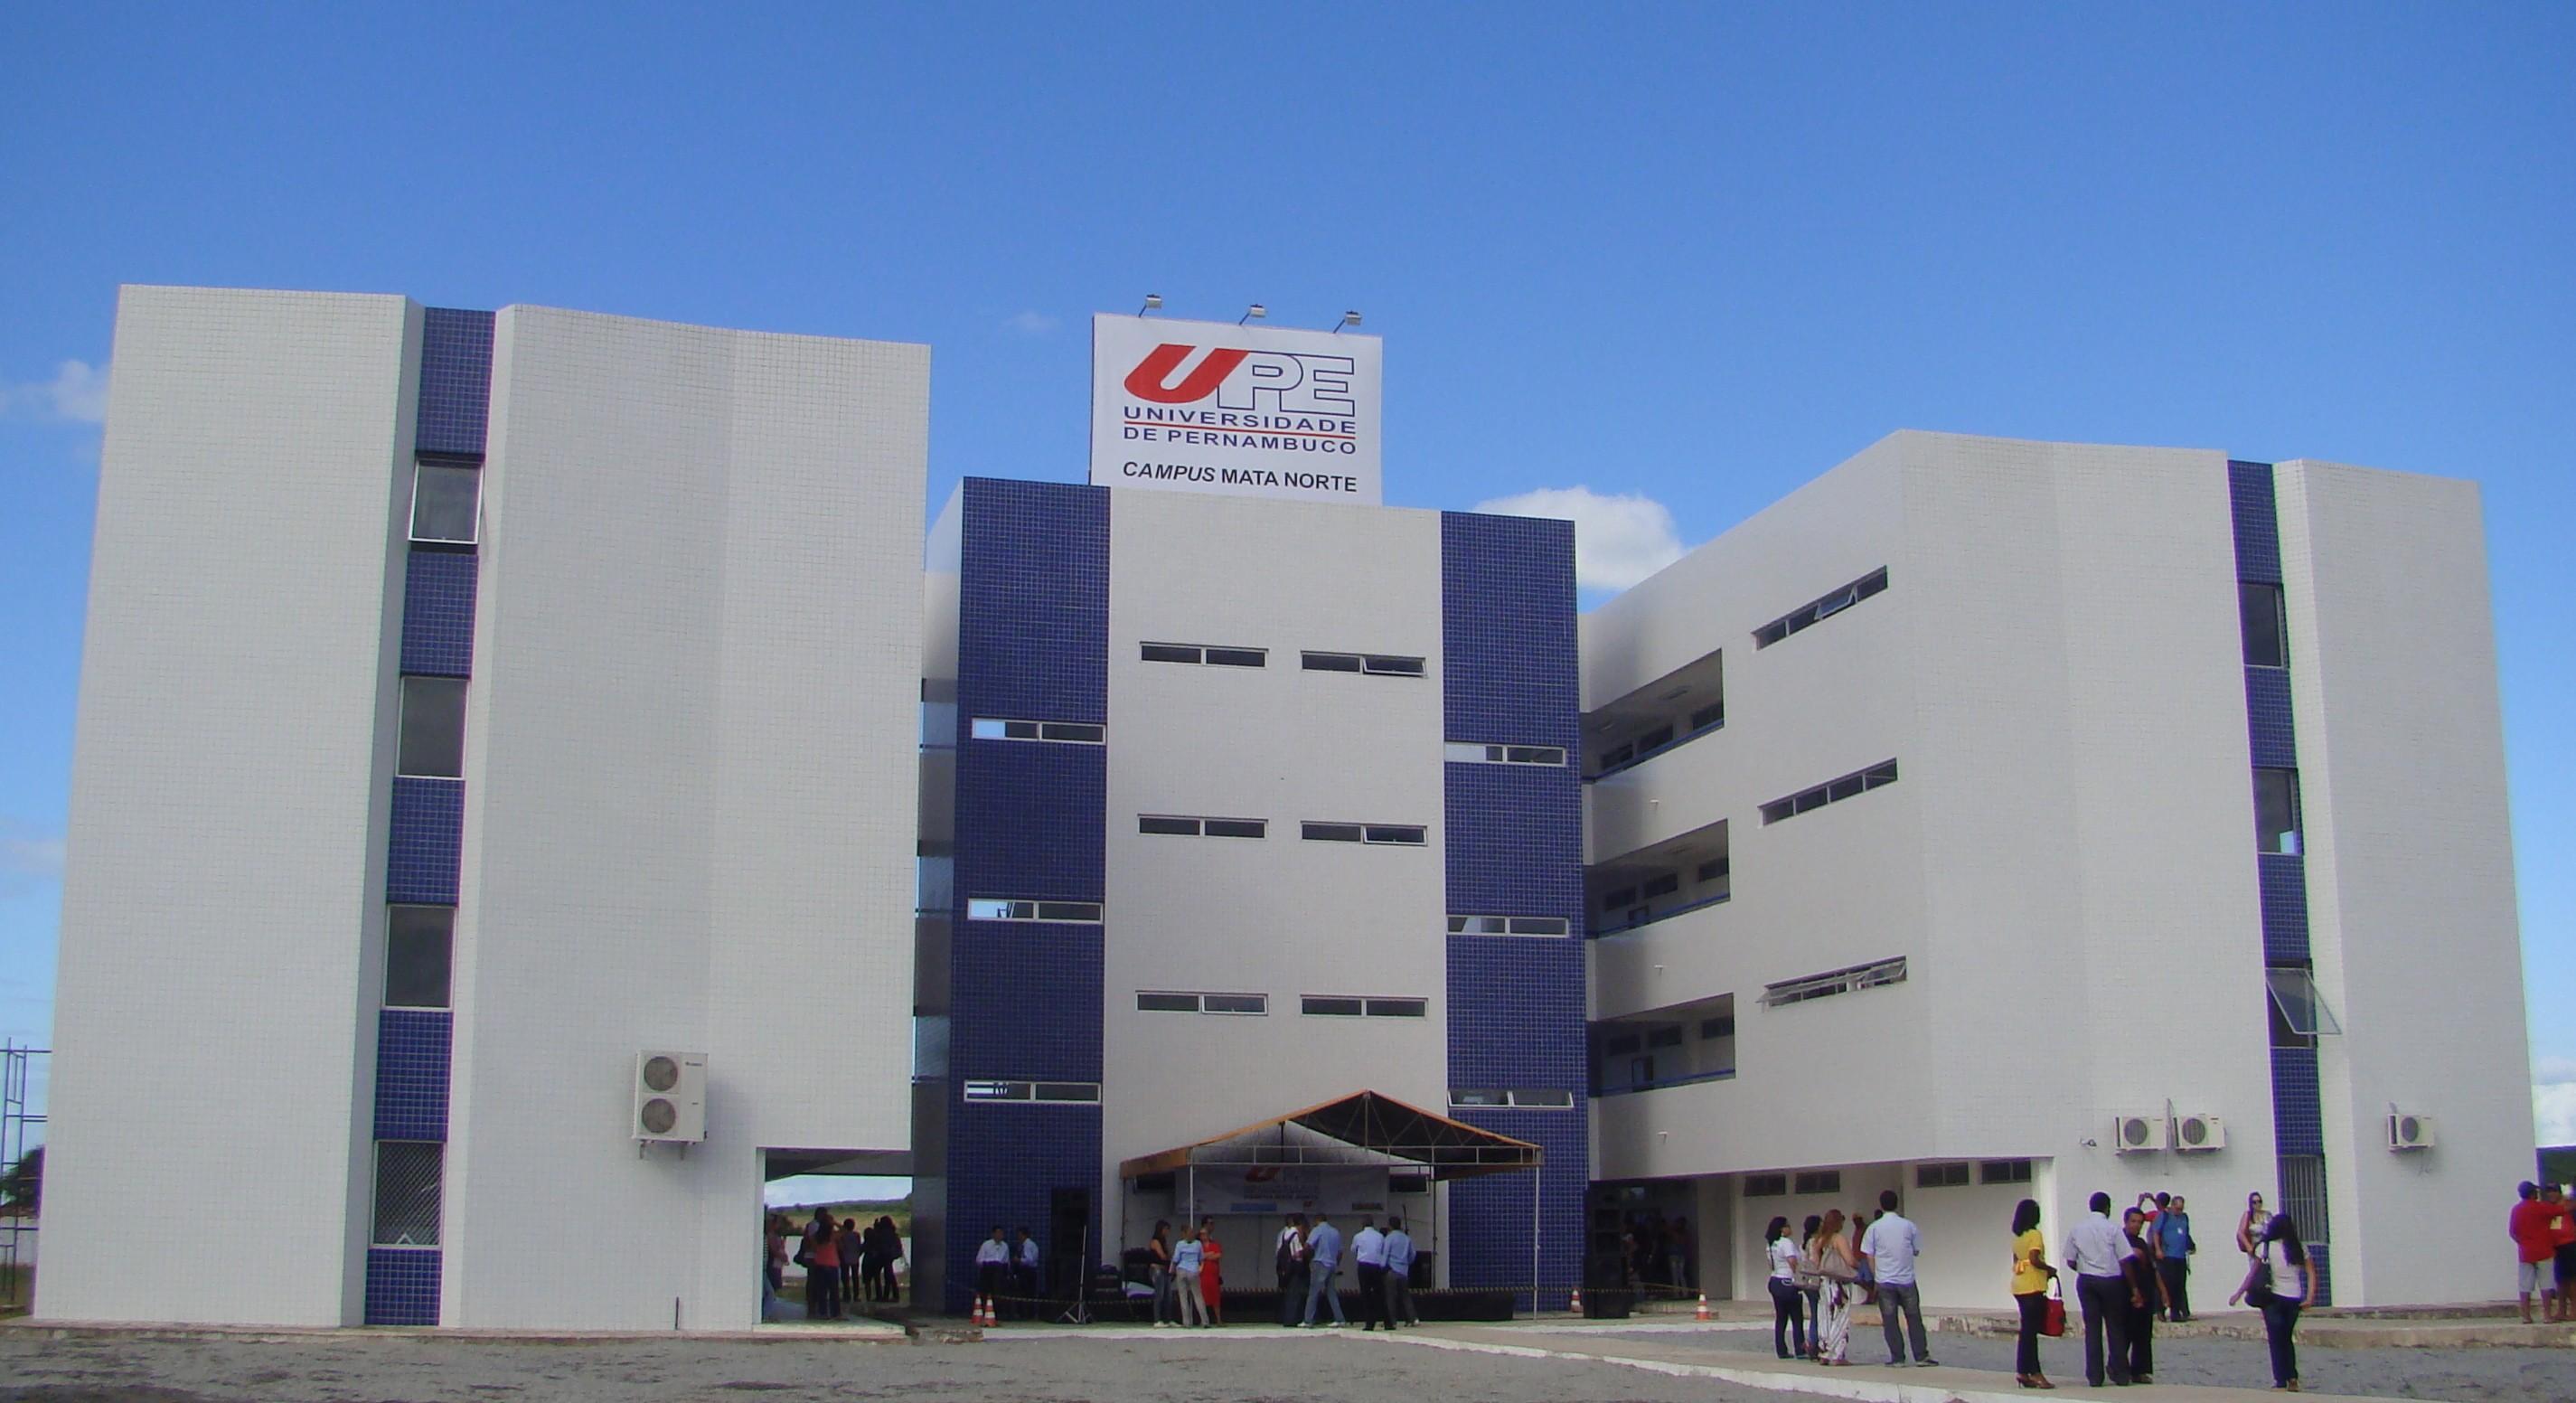 Universidade de Pernambuco oferece curso sobre 'golpe político' para debater impeachment de 2016